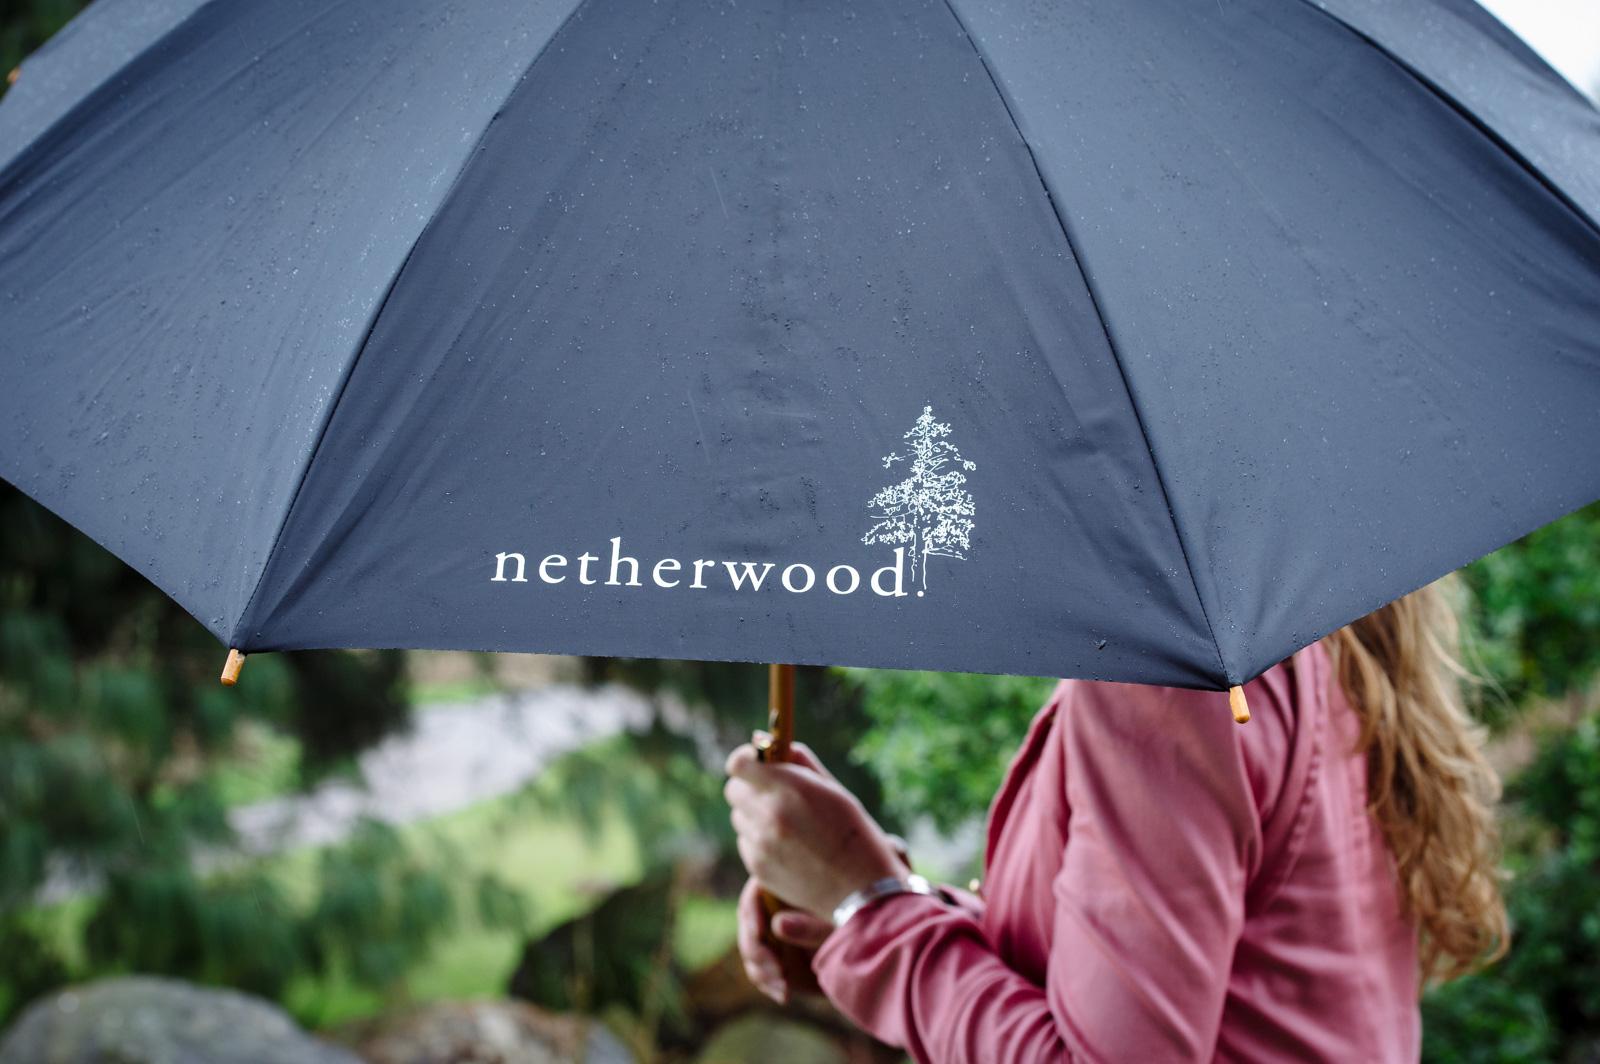 Netherwood umbrella